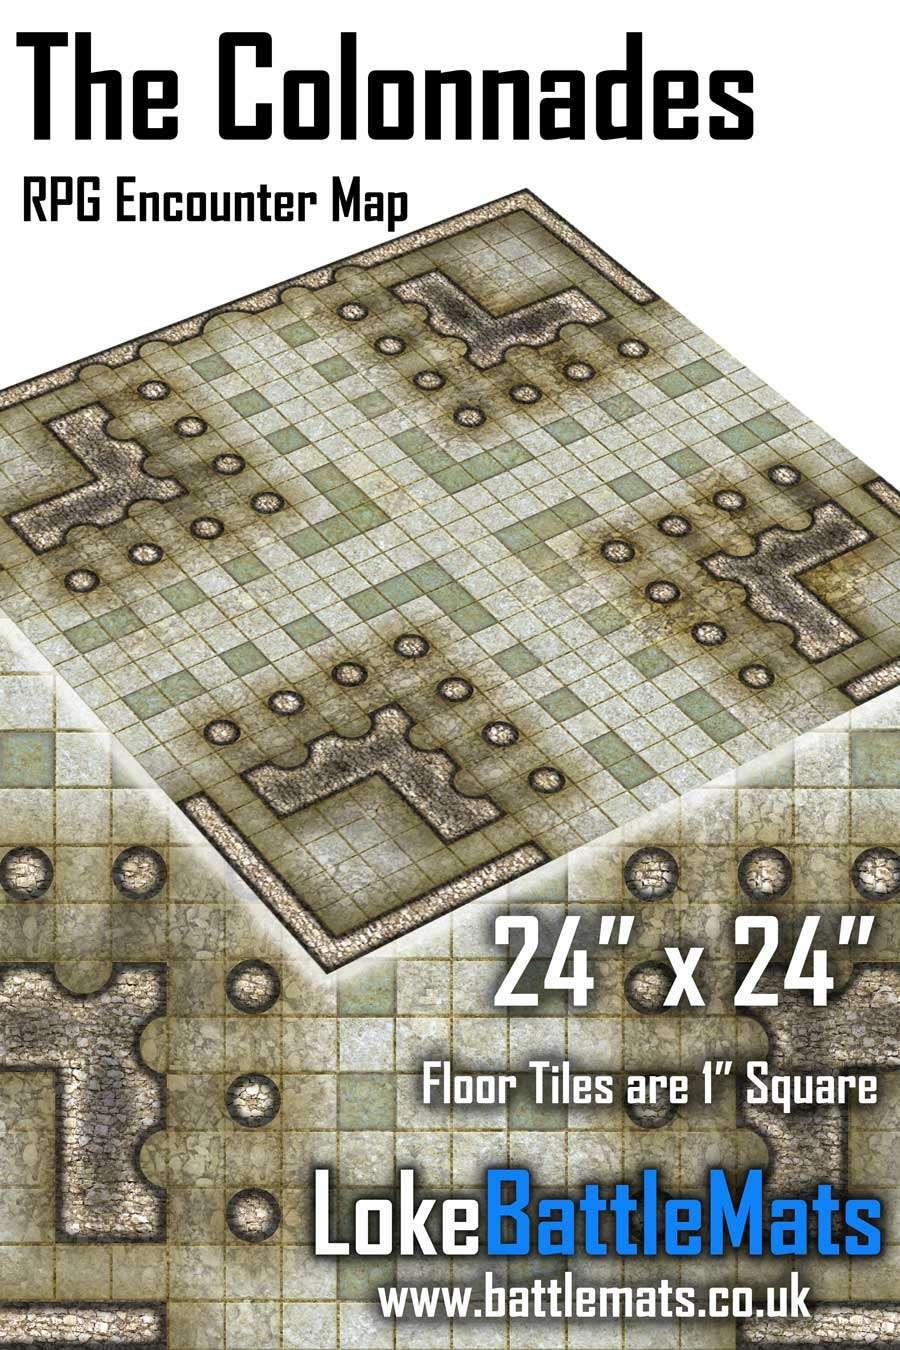 "The Colannades 24"" x 24"" RPG Encounter Map"